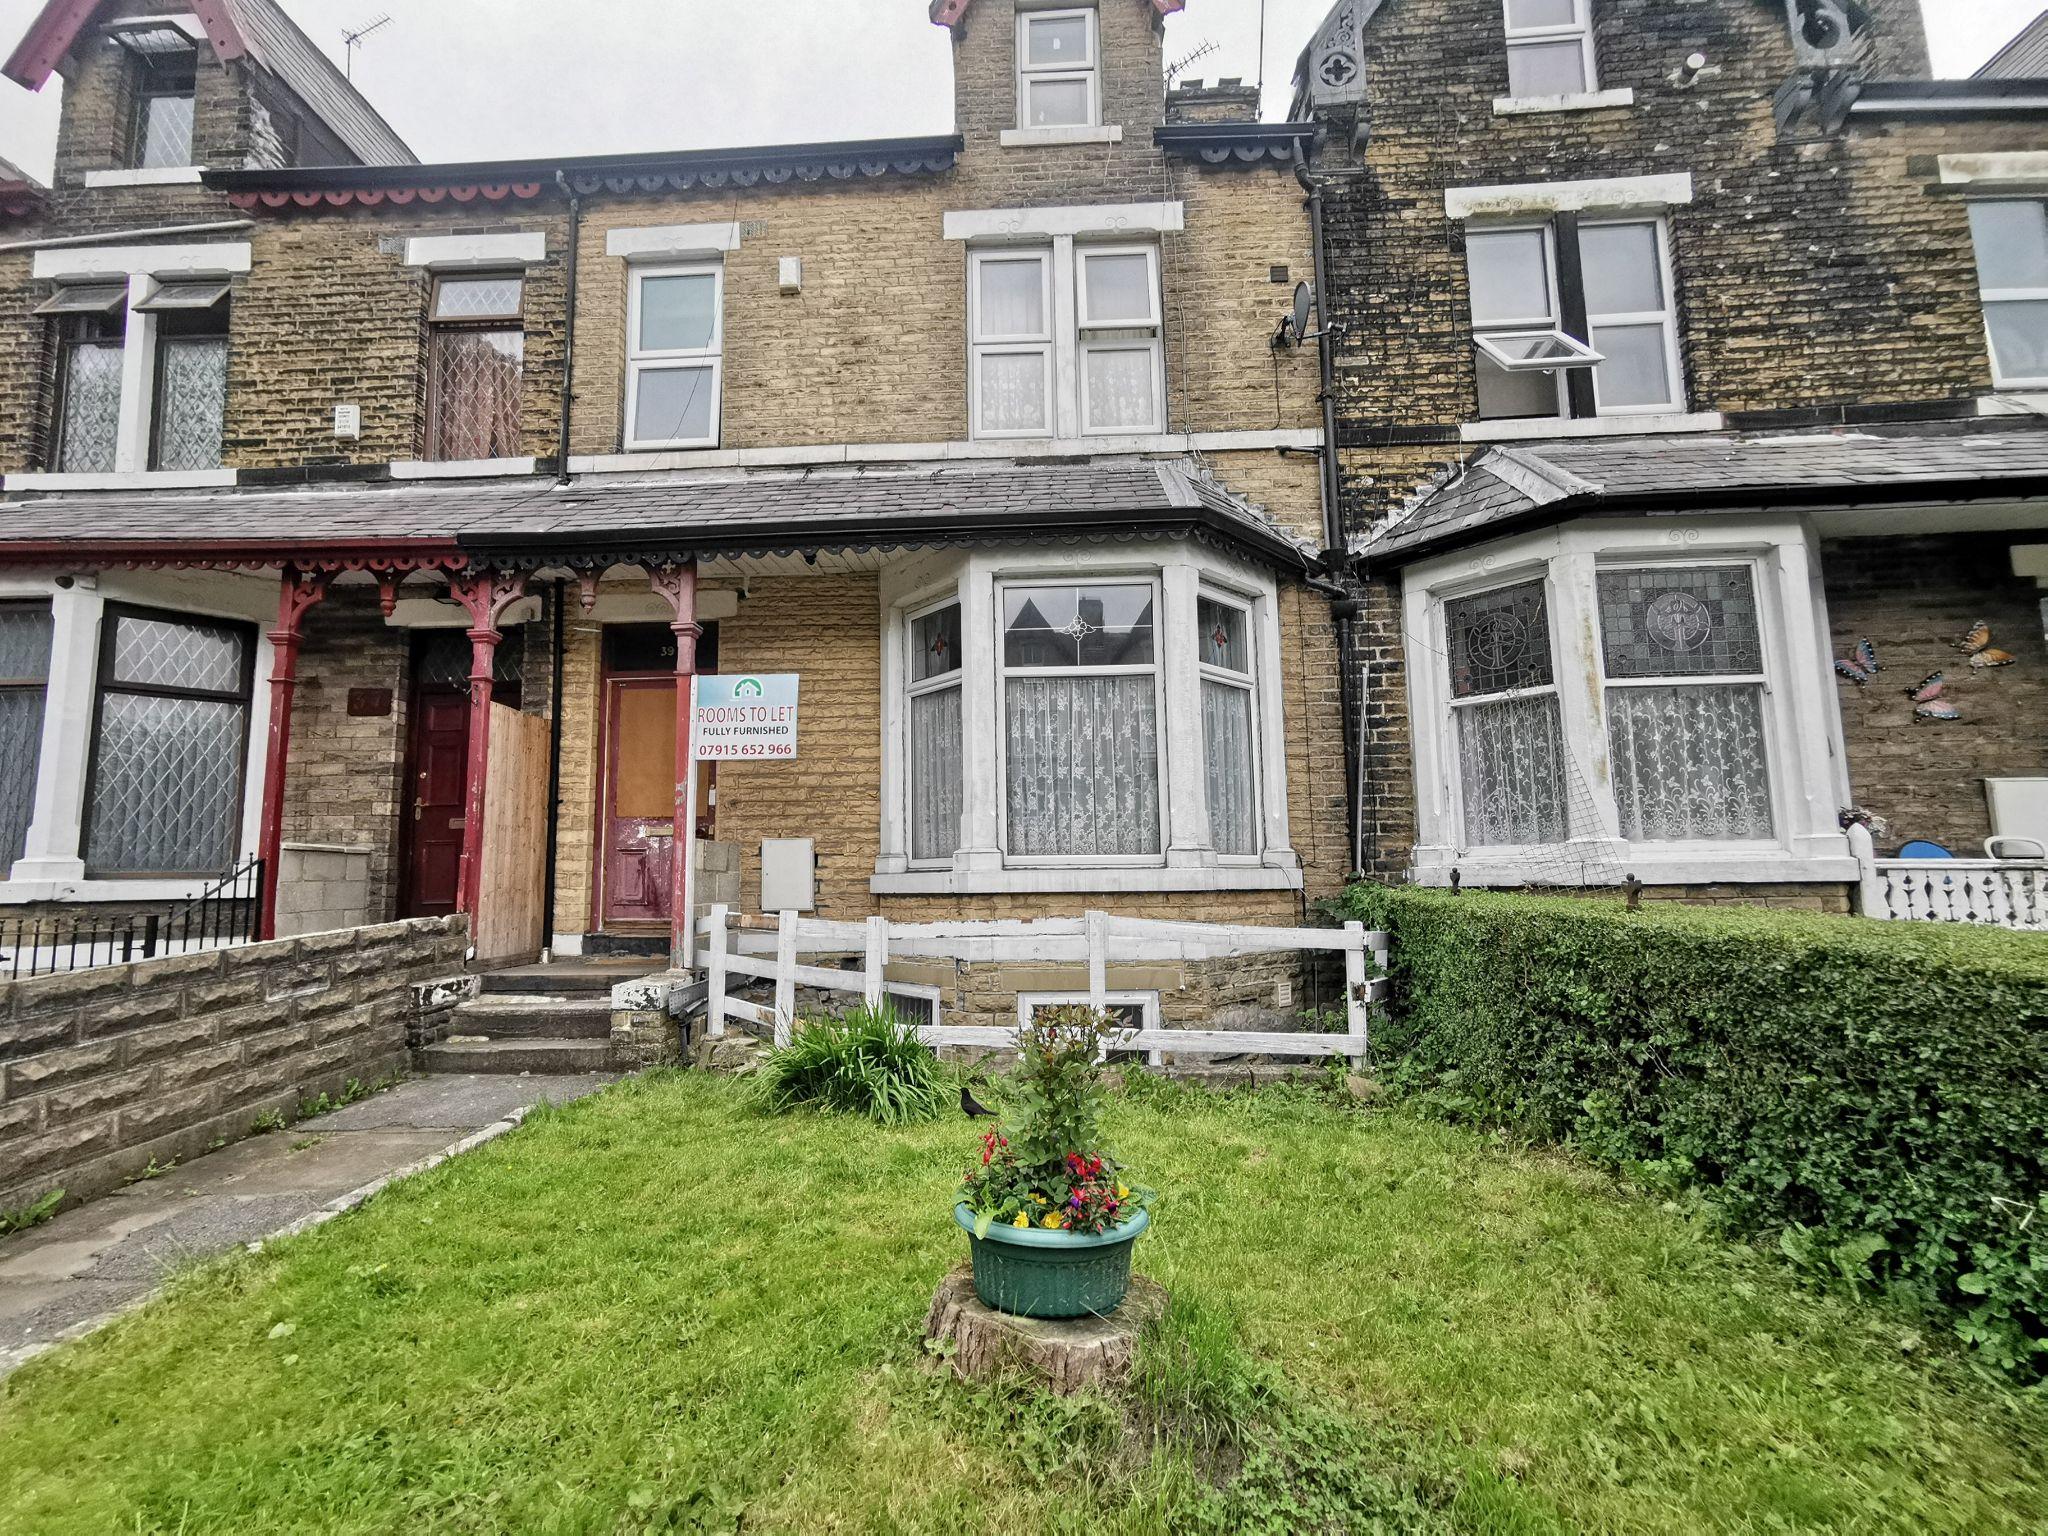 1 bedroom bedsit flat/apartment in Bradford - Photograph 1.